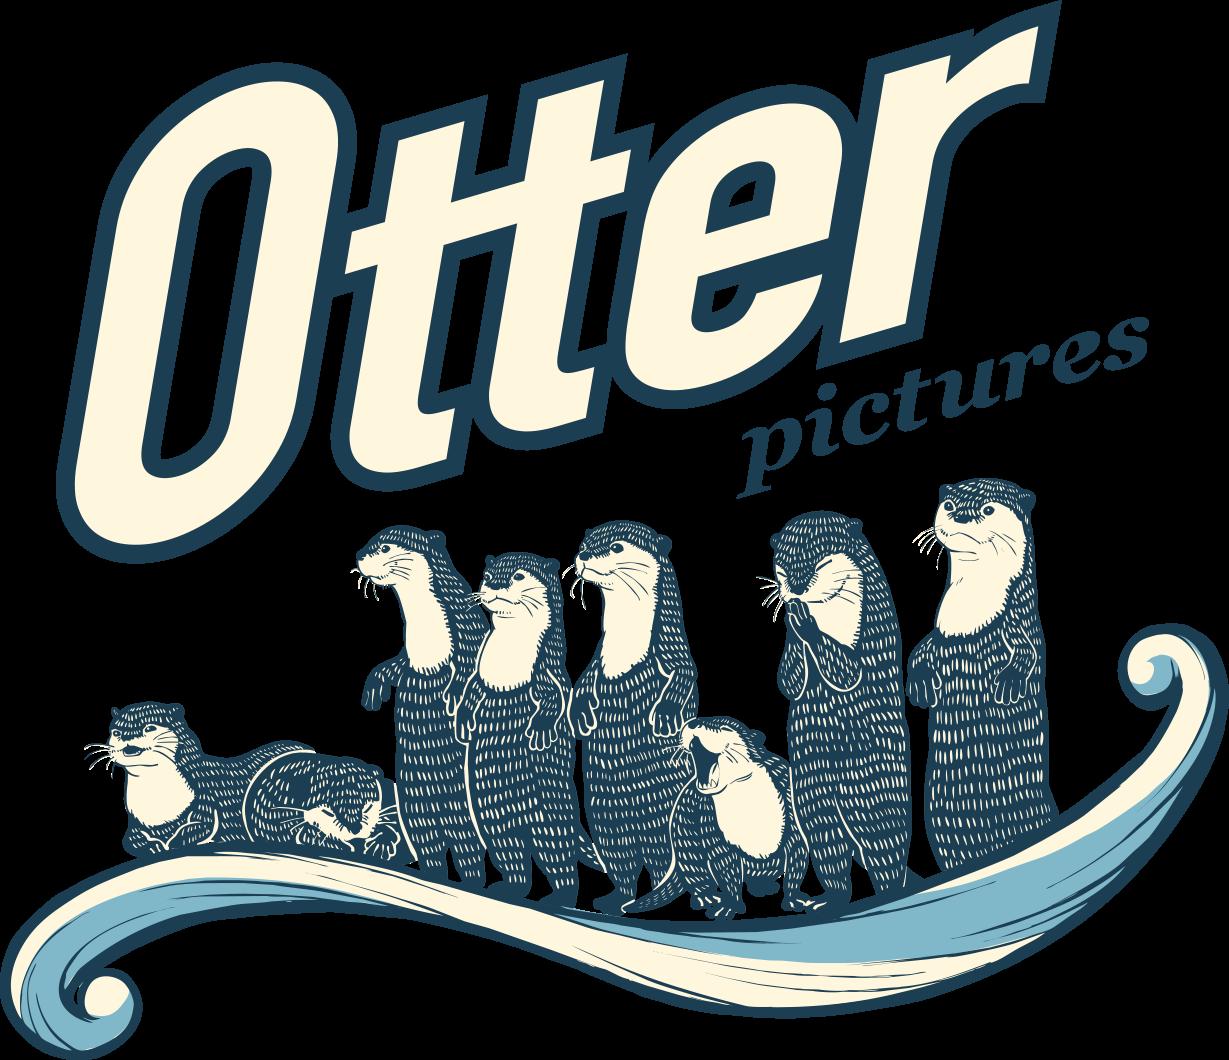 otterpictures.jp